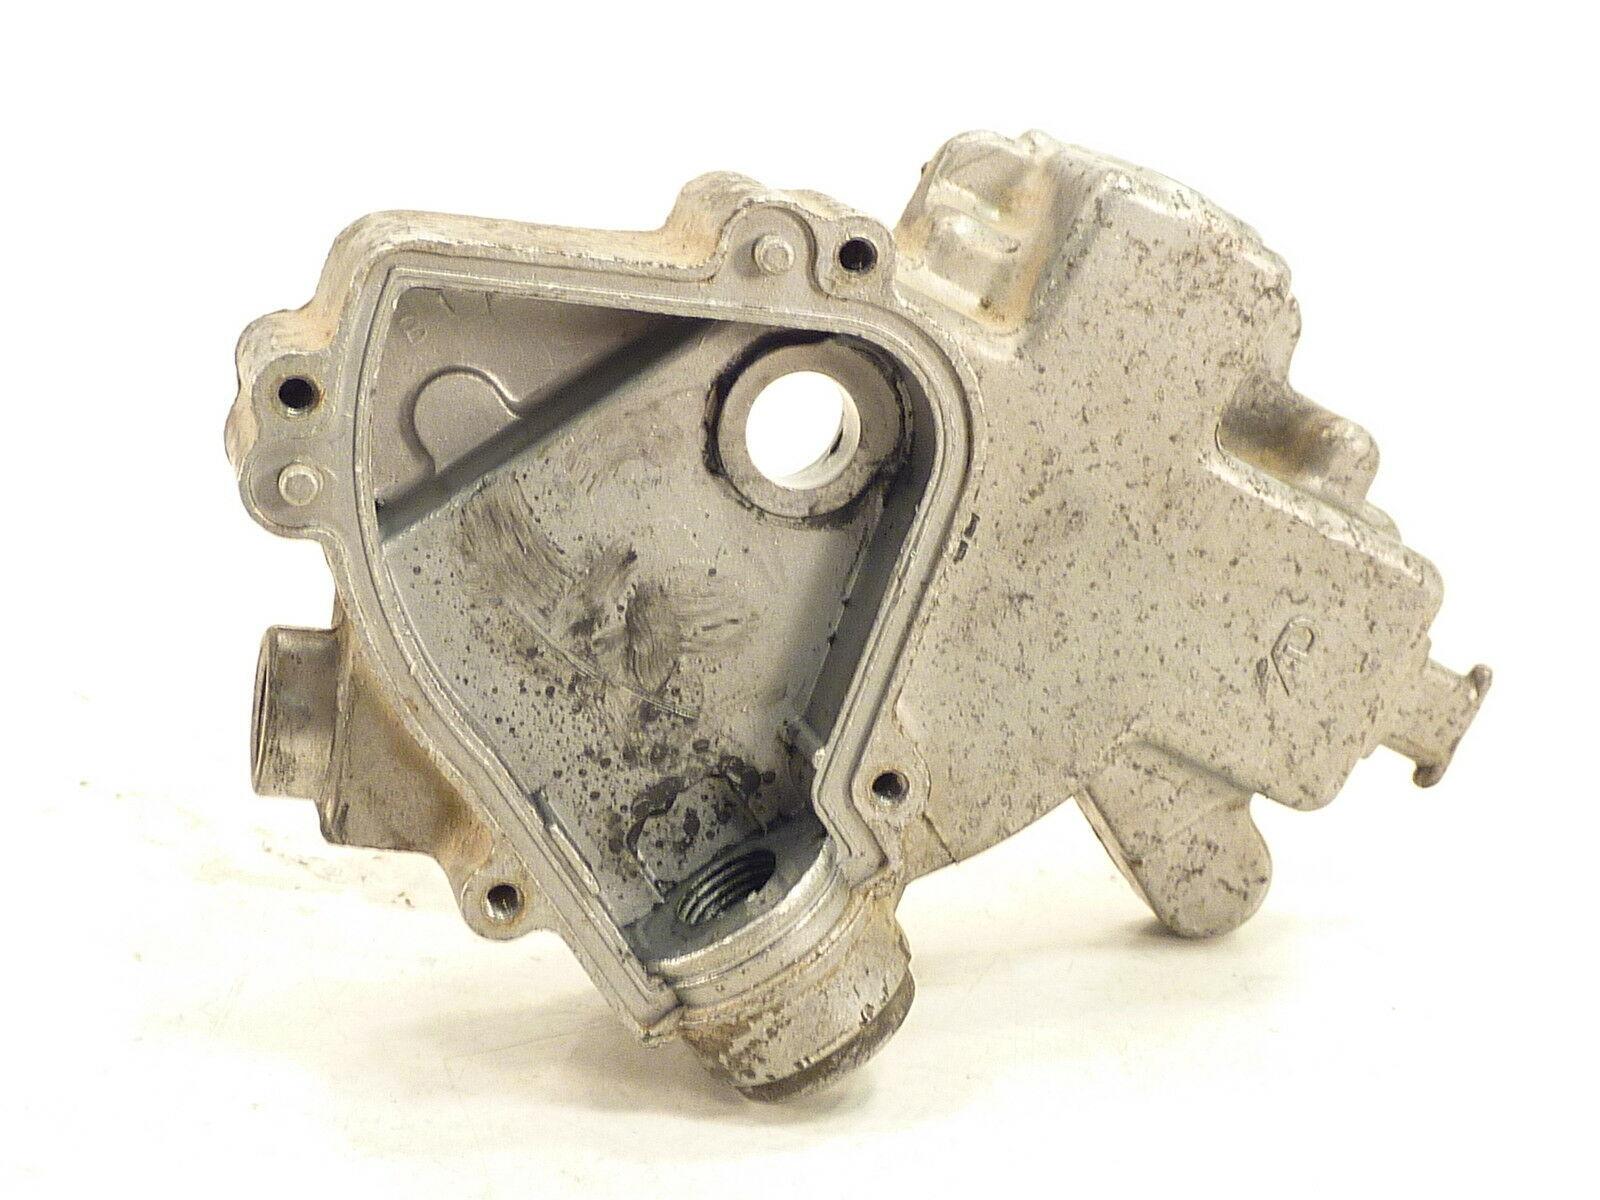 98 Yamaha Blaster Carburetor Switch Box Main Housing / OEM Carb Sensor Body